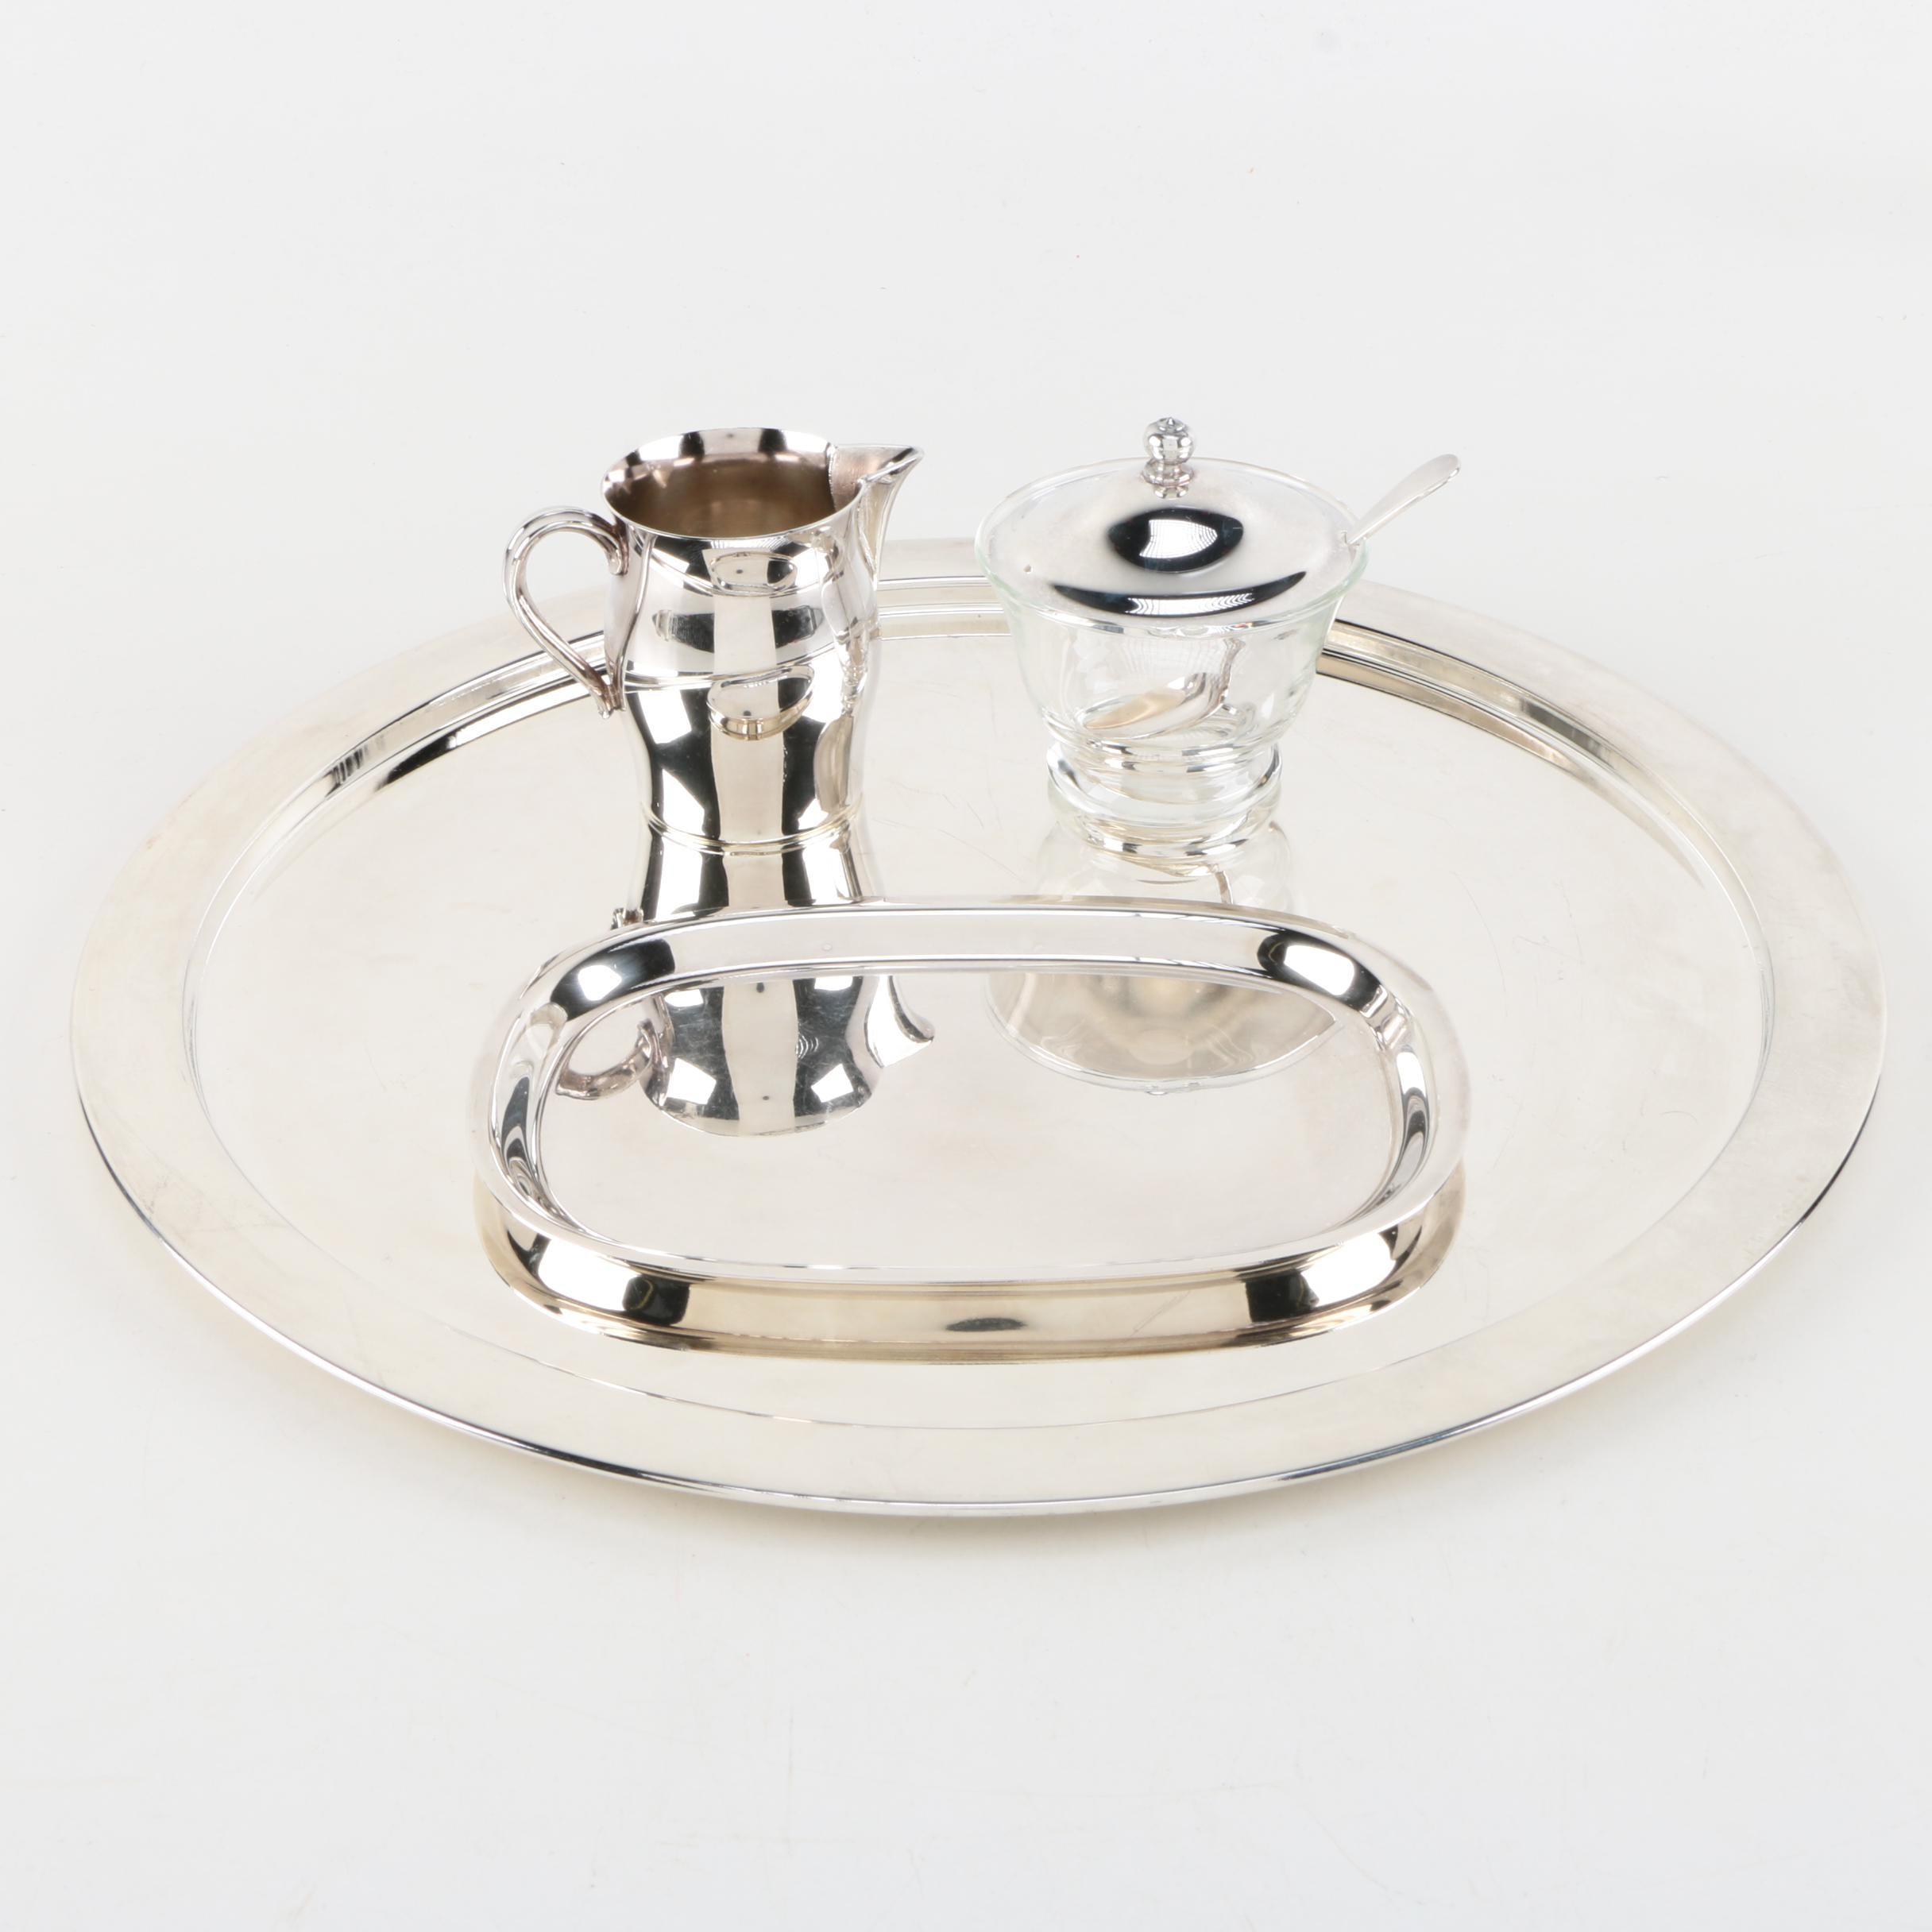 charming Godinger Silver Art Co. Ltd Part - 6: Silver Plate Serveware Featuring Godinger Silver Art Co. Ltd. ...